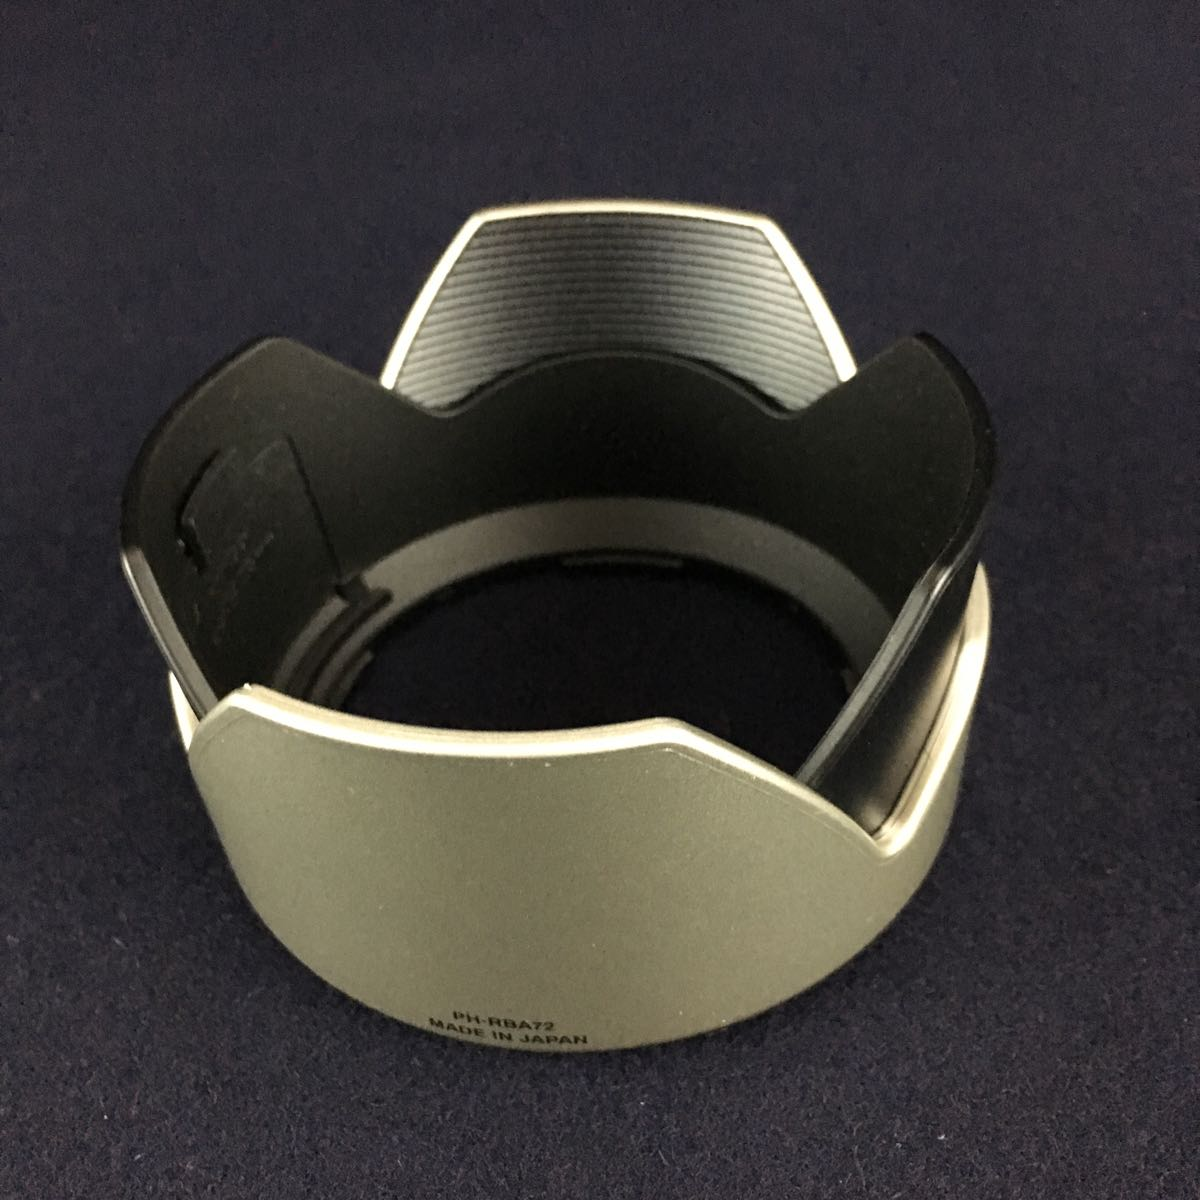 PENTAX-FA 43mm 1.9 Limited / FA 28-200mm 3.8-5.6 オートフォーカスレンズ2点_画像8